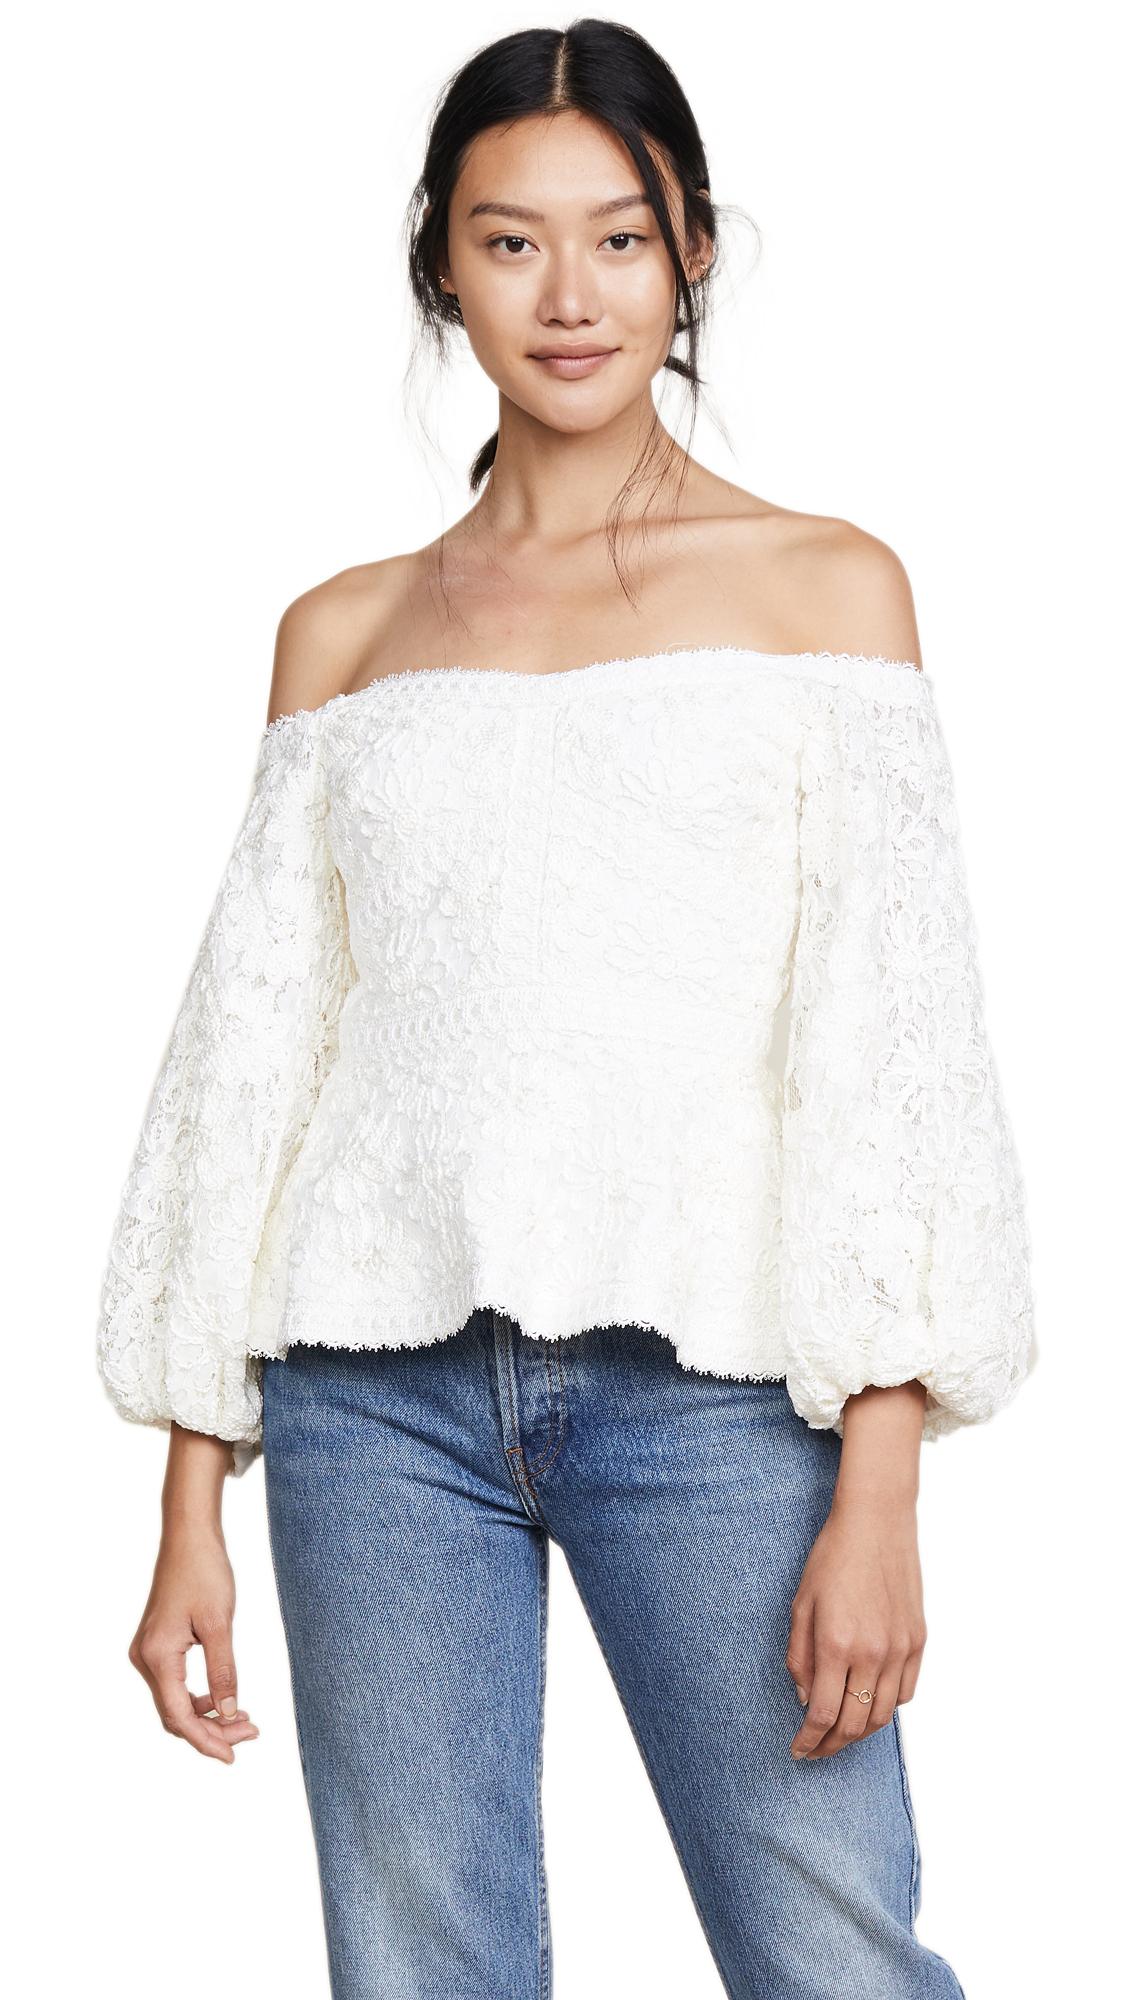 Alexis Joscelin Top - Ivory Lace